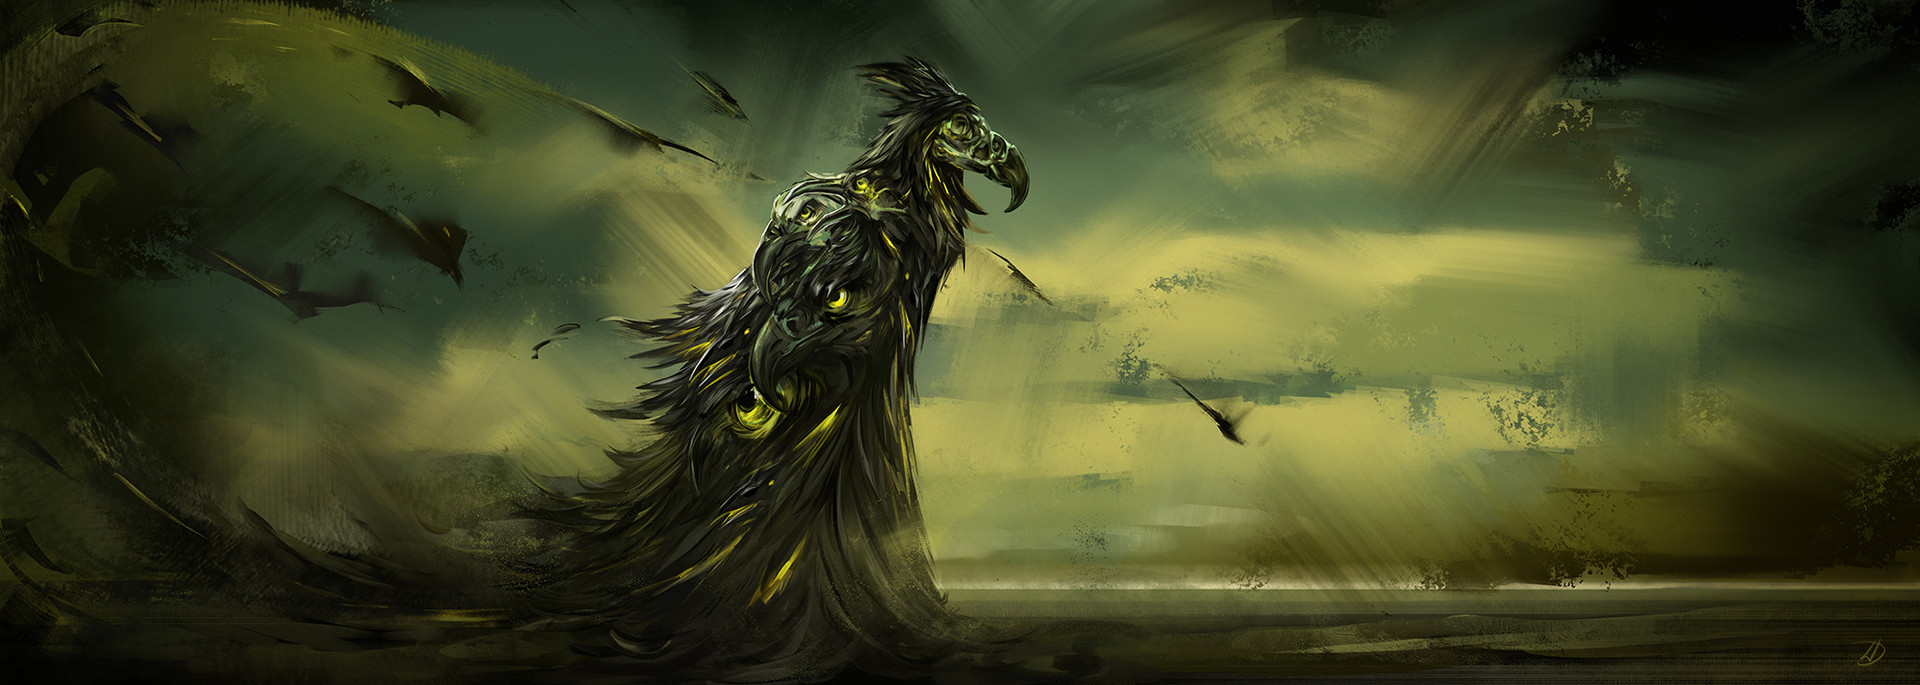 Wojtek depczynski birdman2